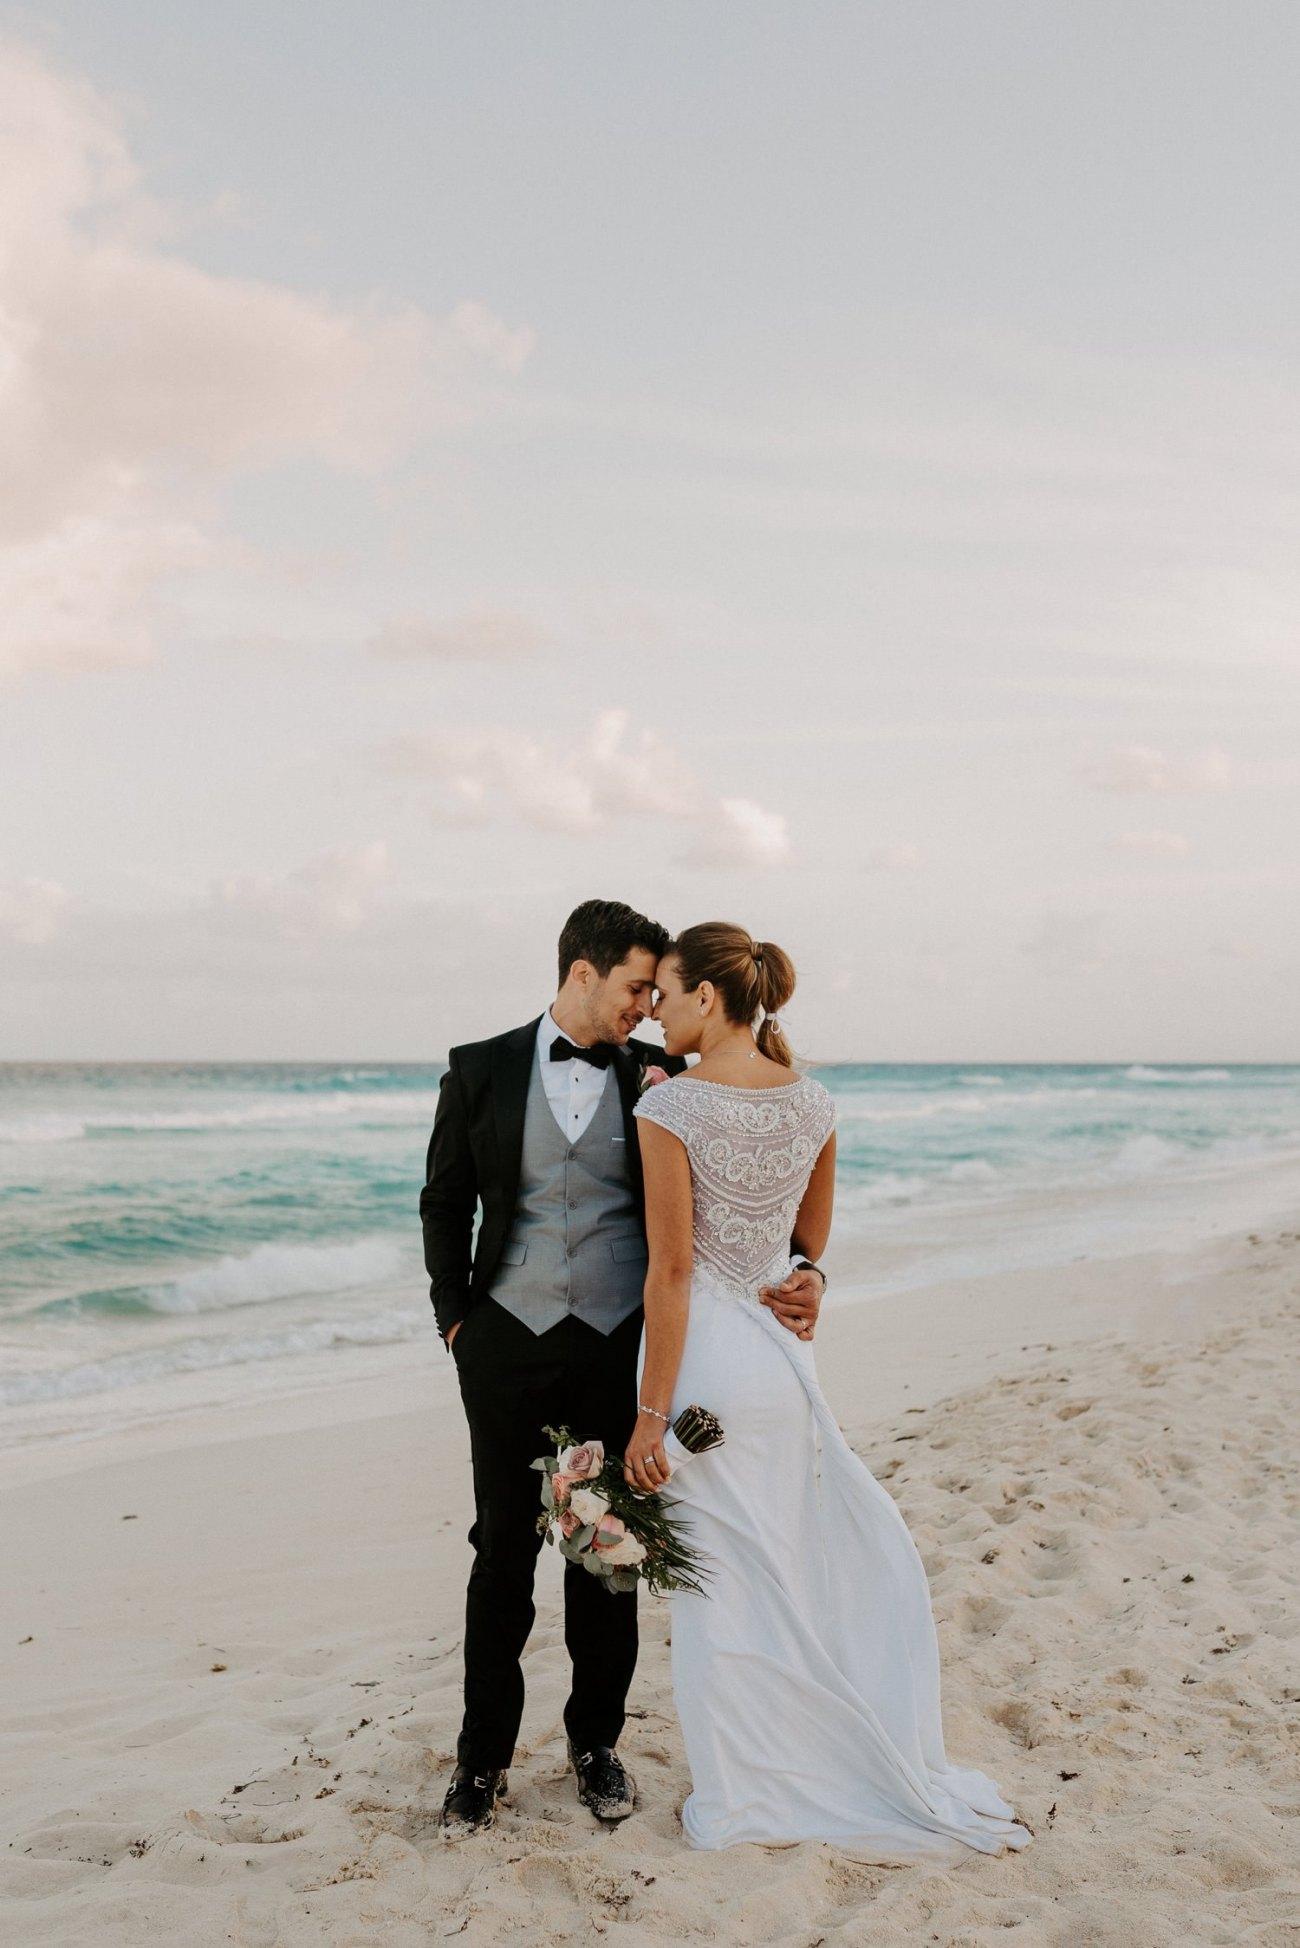 Cancun Destination Wedding Mexico Tulum Wedding Photographer Anais Possamai Photography 046